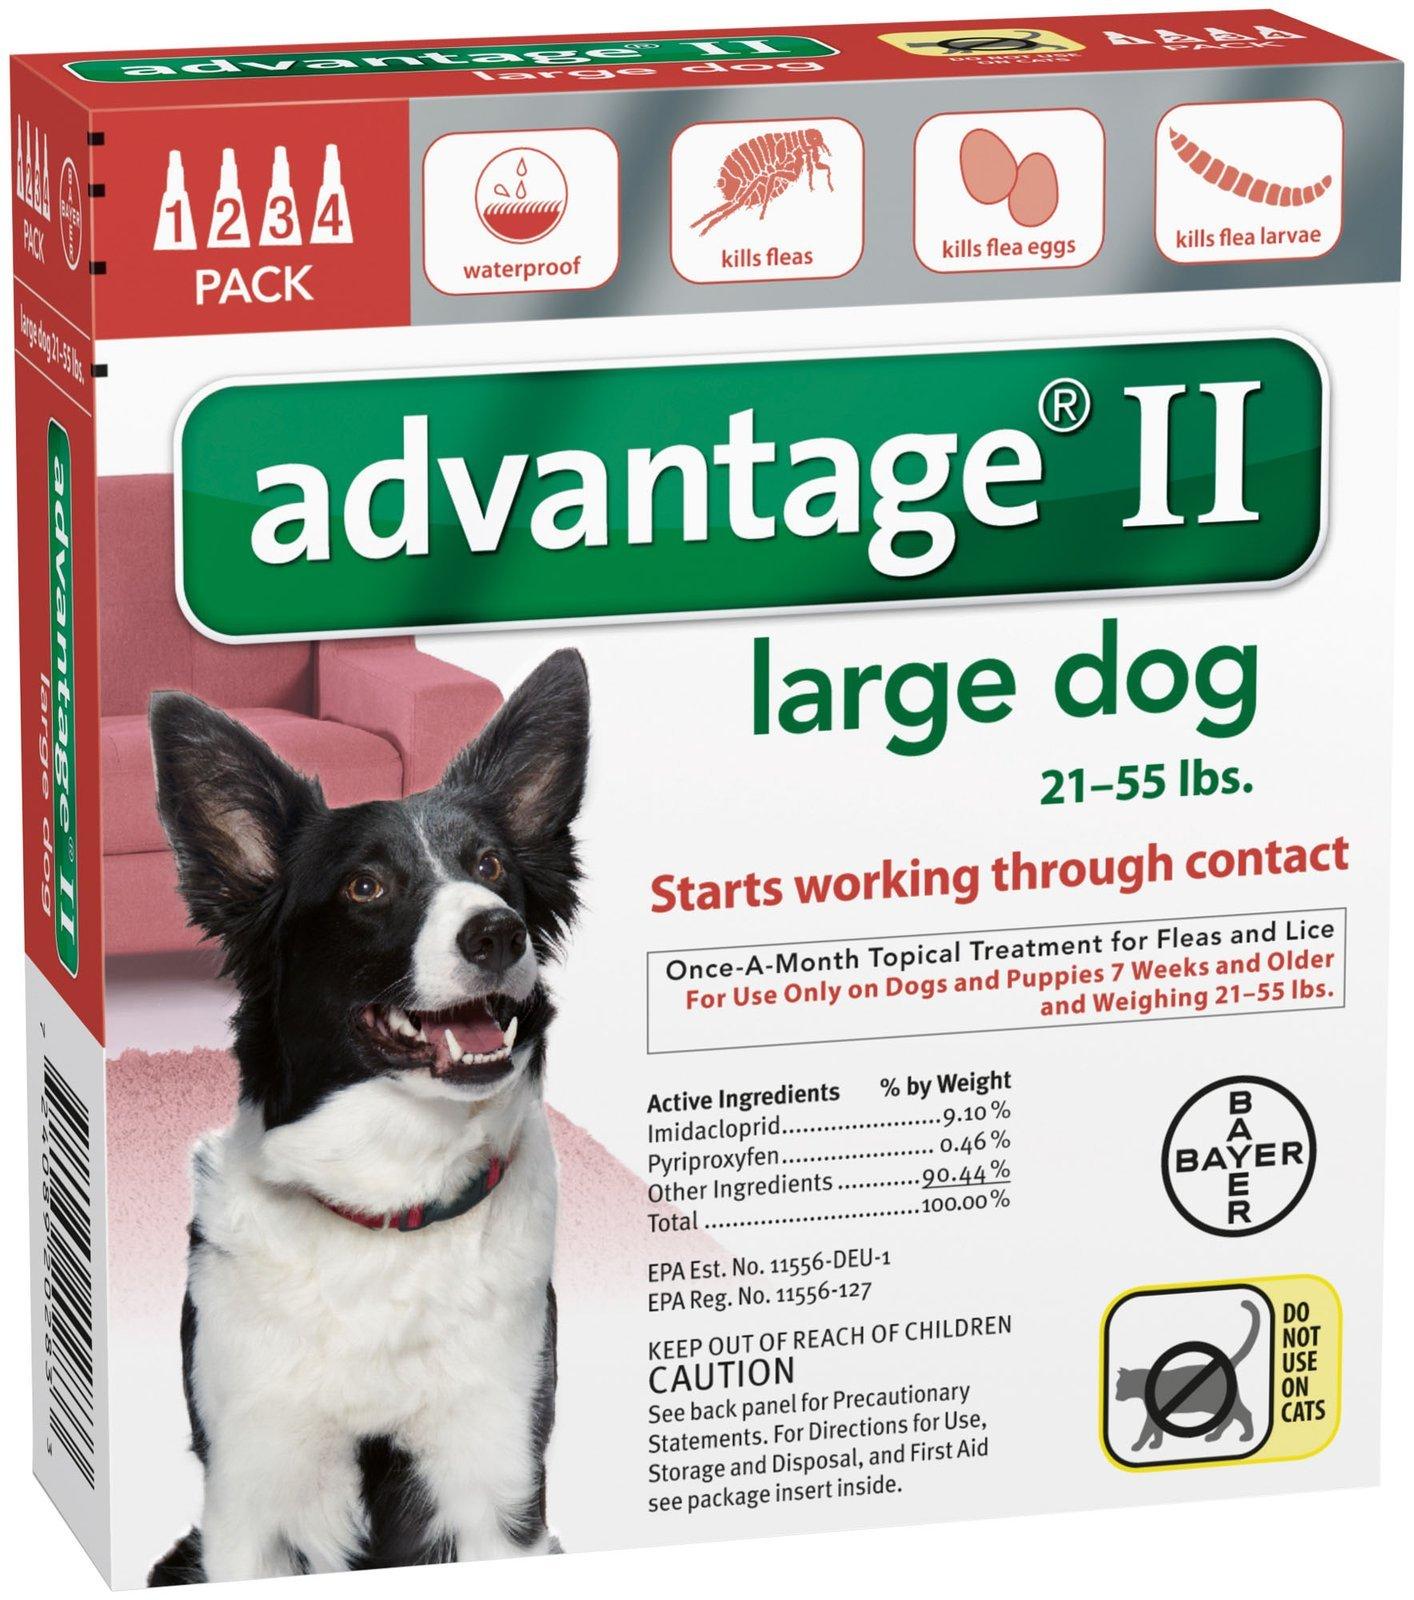 Bayer Animal Health Advantage II Large Dog 4-Pack by Bayer Animal Health